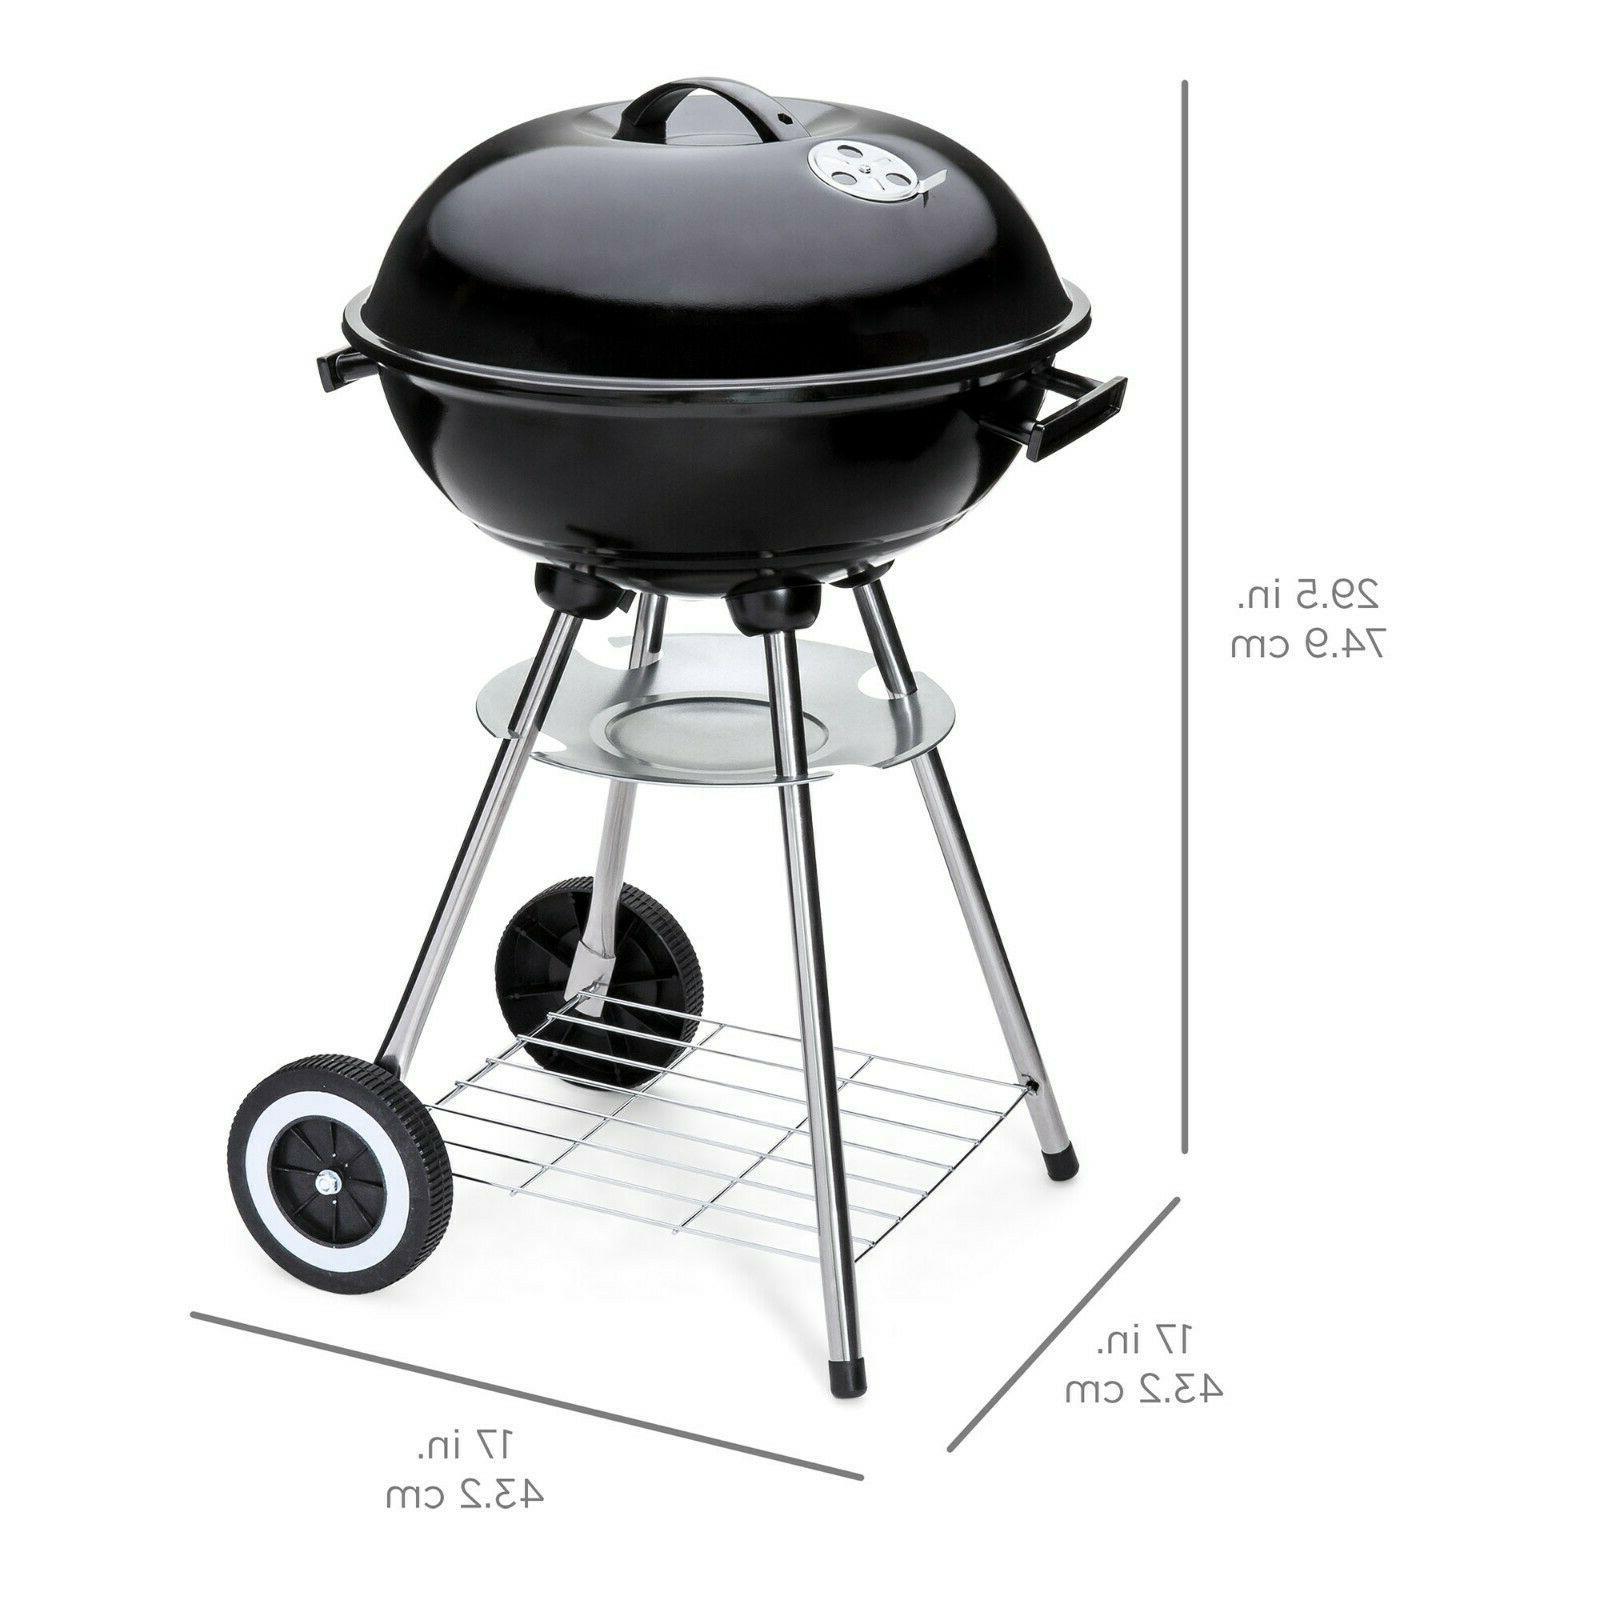 Charcoal BBQ Weber Jumbo Joe 18-Inch Kettle Grill